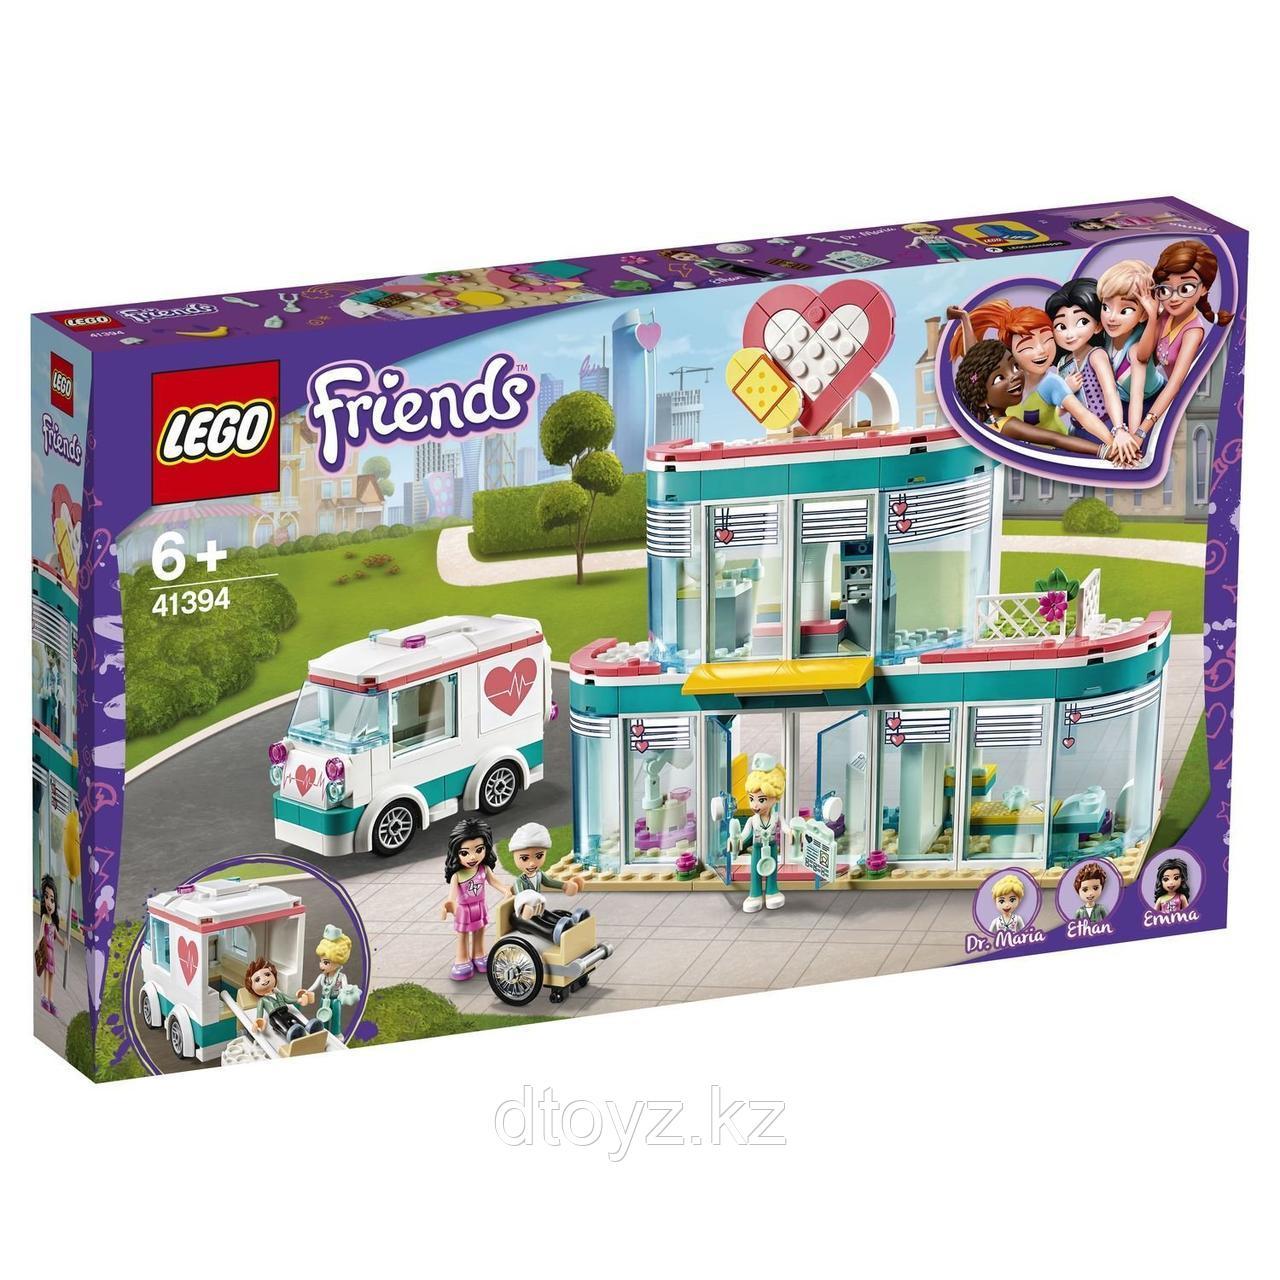 Lego Friends 41394 Городская больница Хартлейк Сити